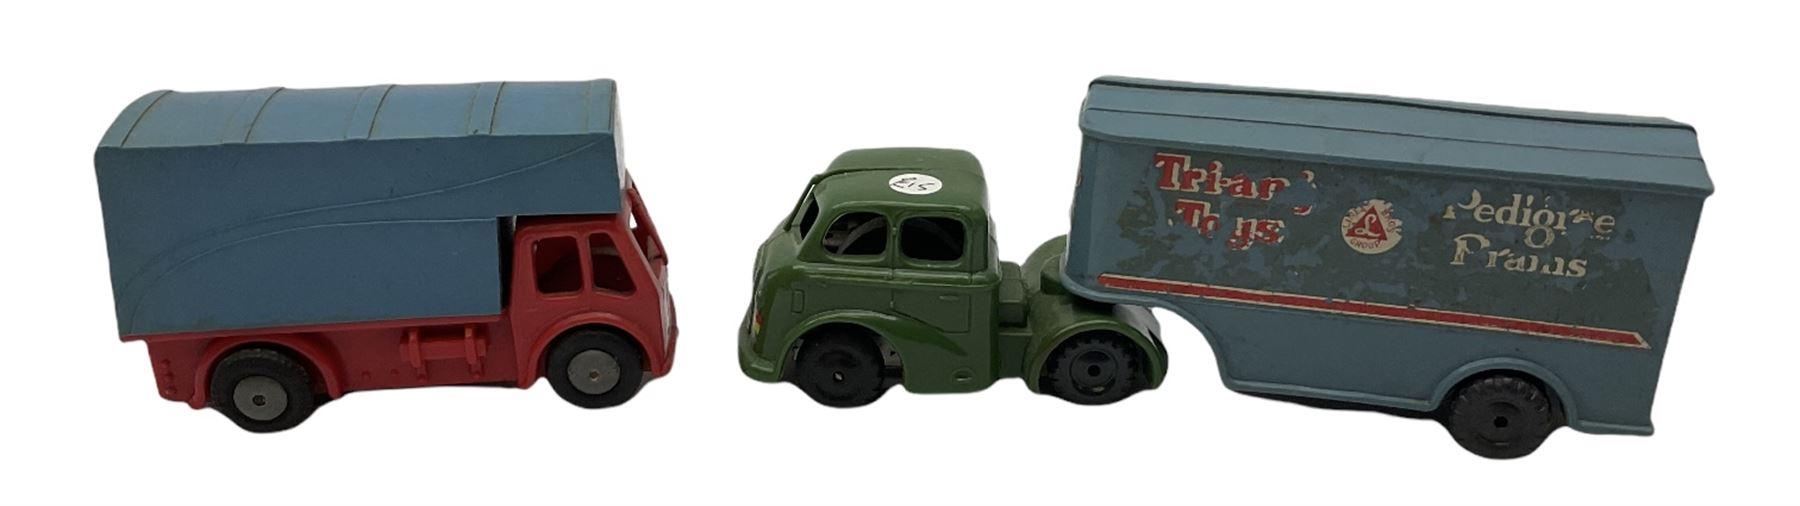 Tri-ang/Tri-ang Minic - twelve plastic friction-drive vehicles comprising Tri-ang Toys/Pedigree Pram - Image 7 of 7